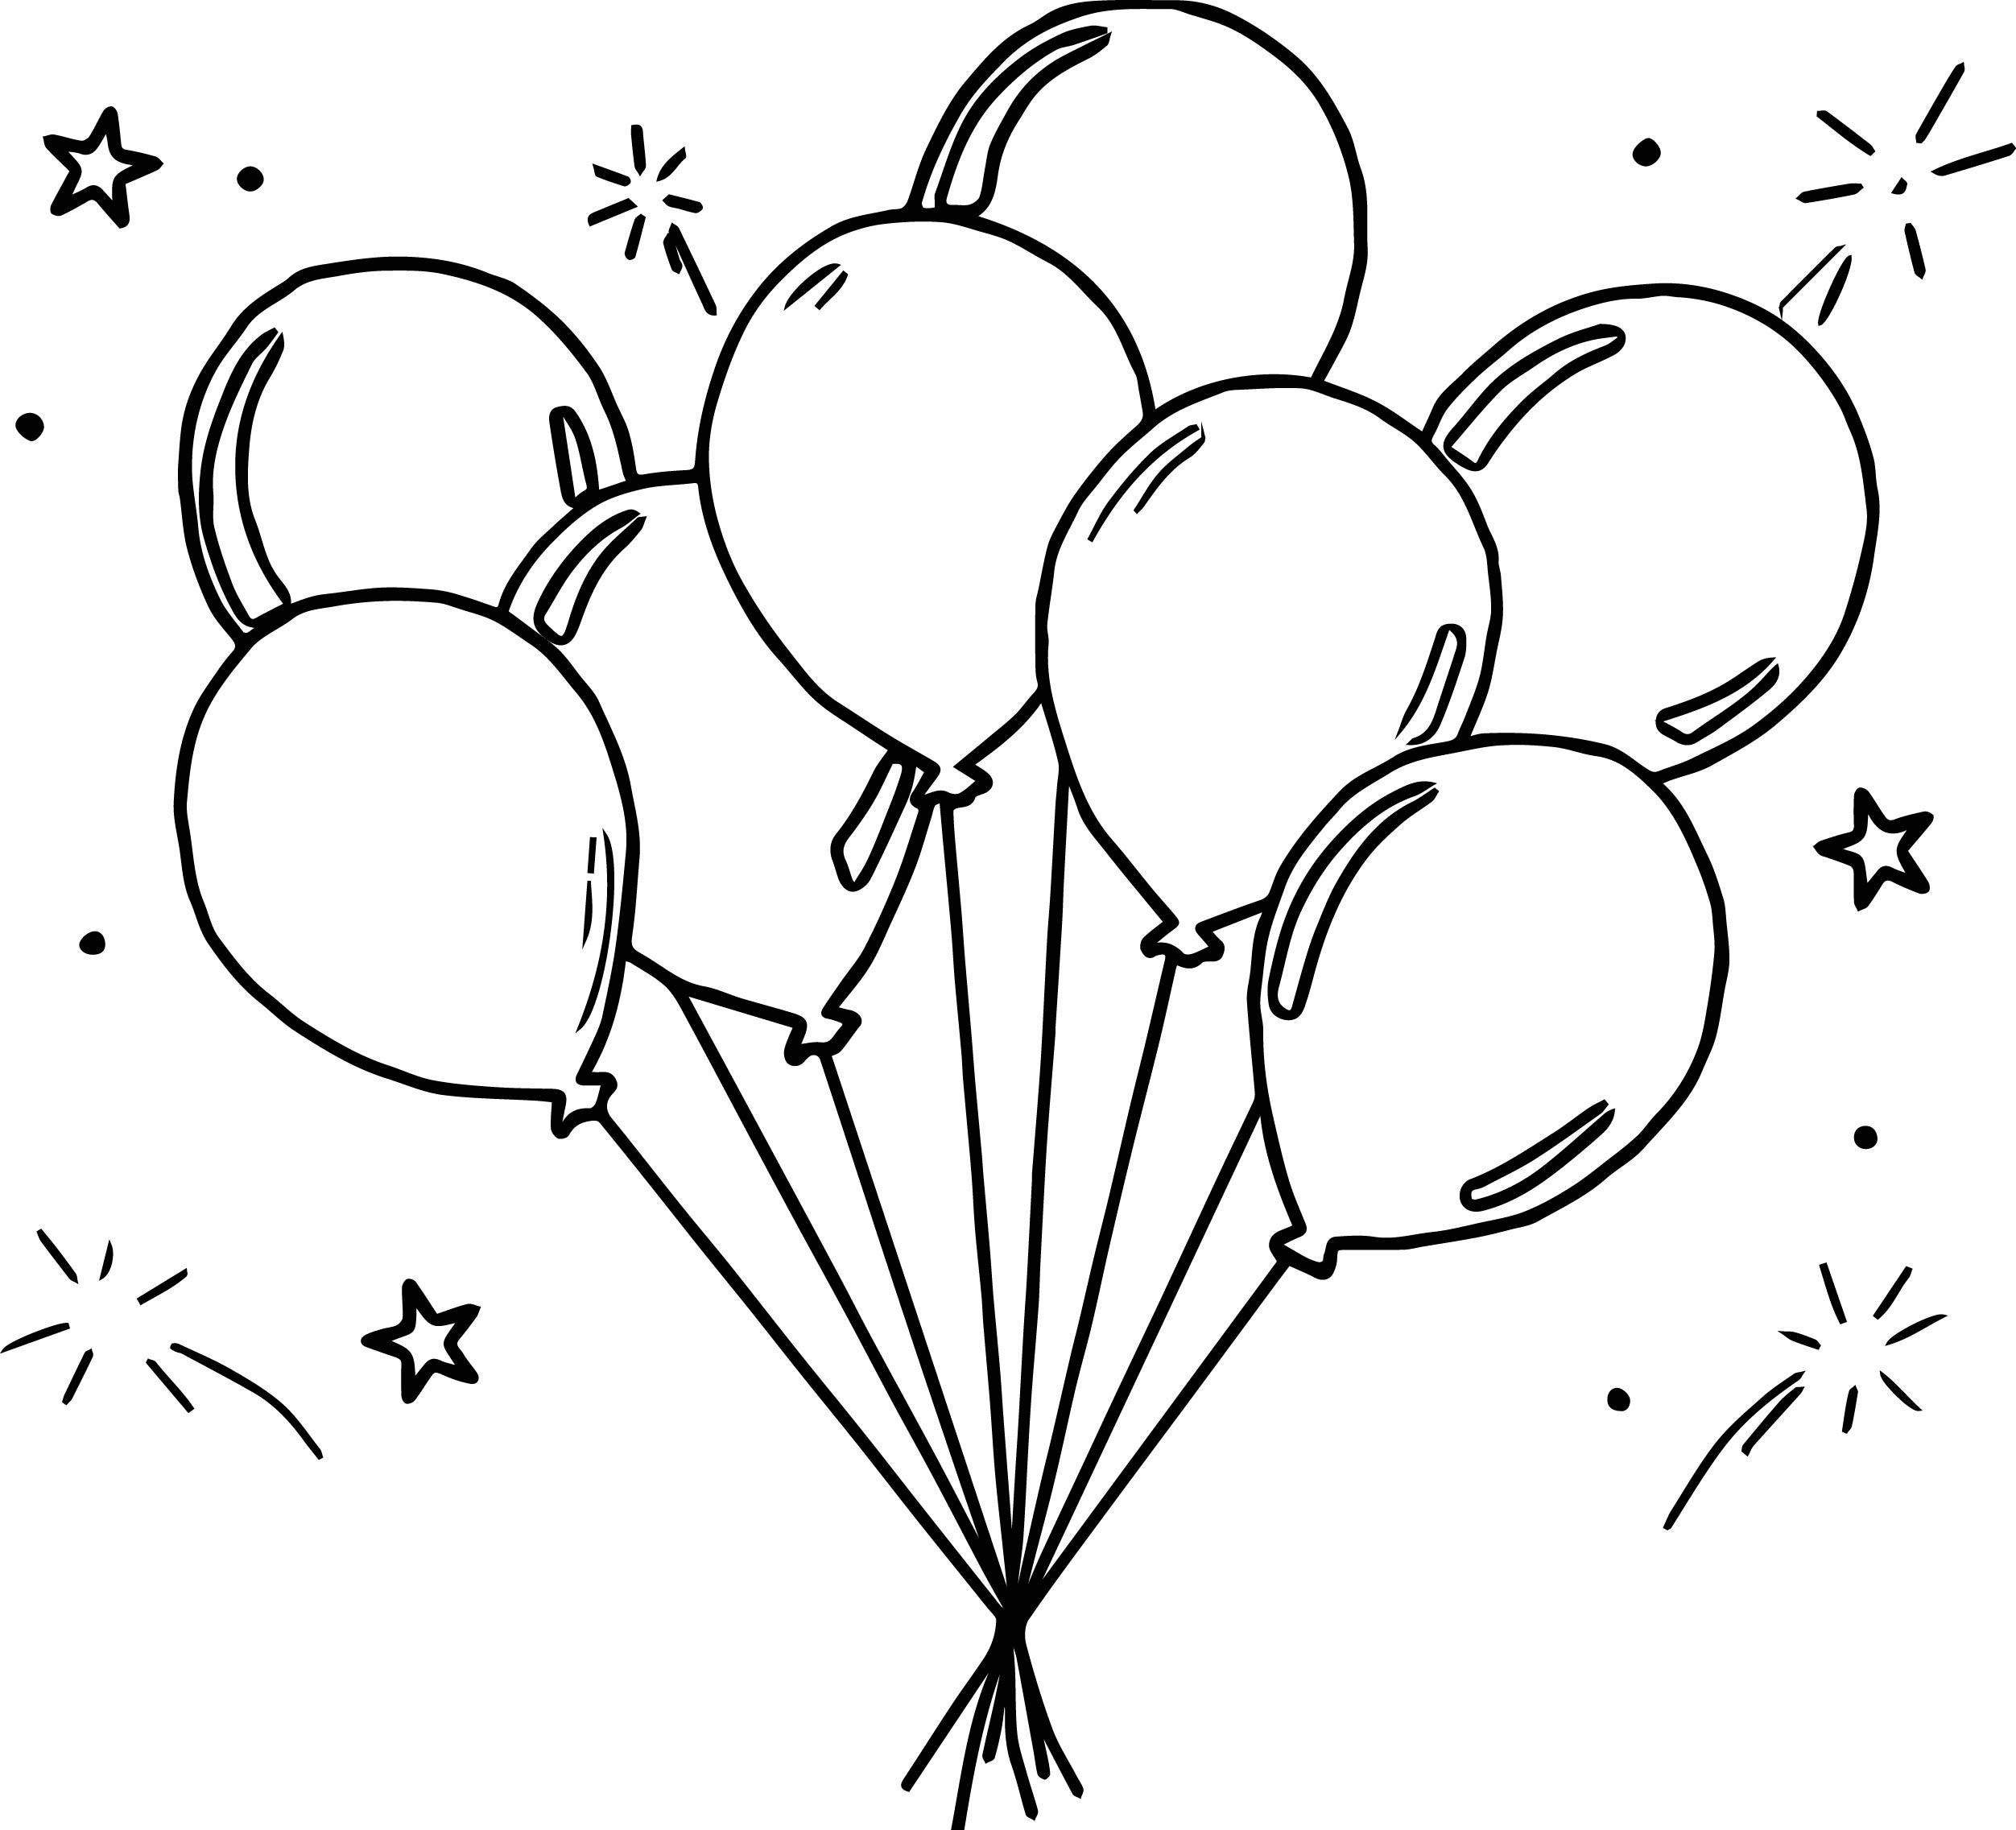 Amusement Balloon Coloring Page